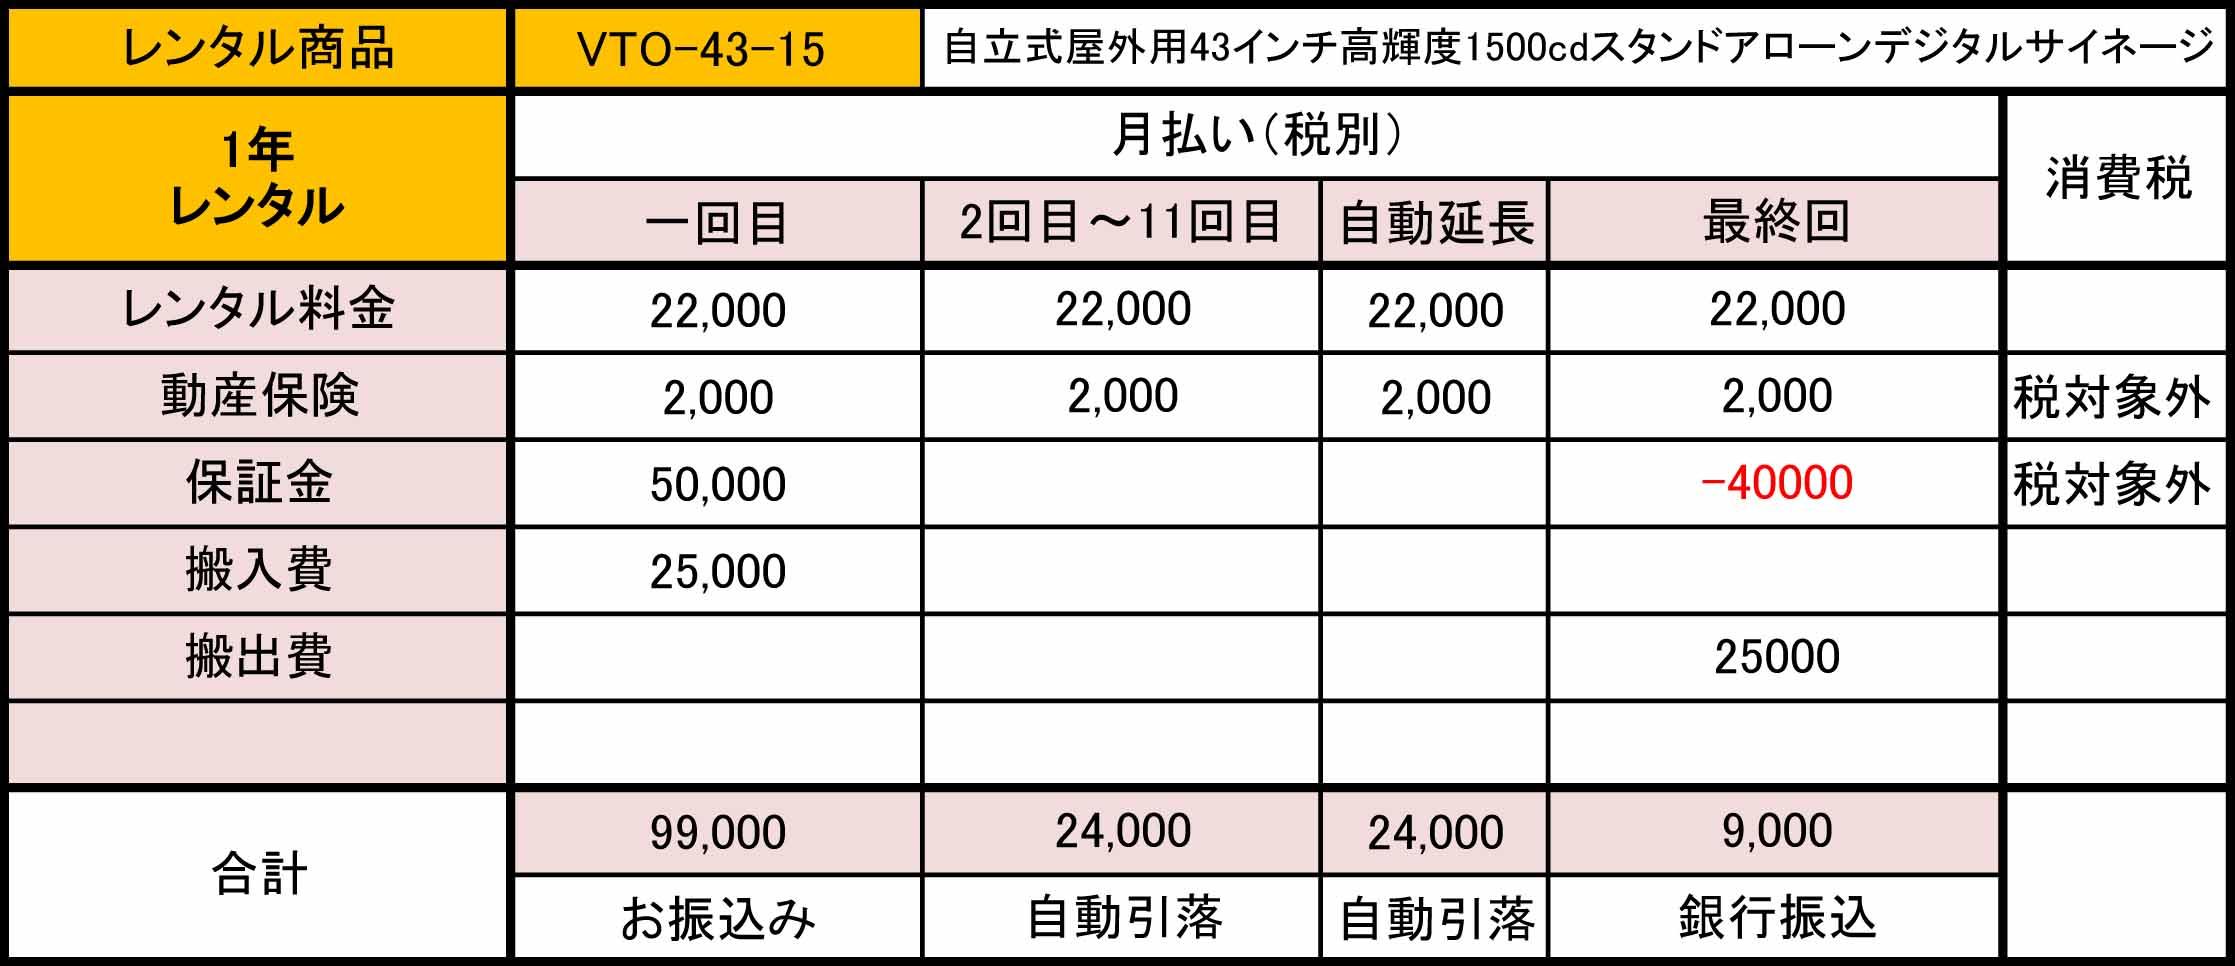 VTO-43-15 1年レンタル価格表